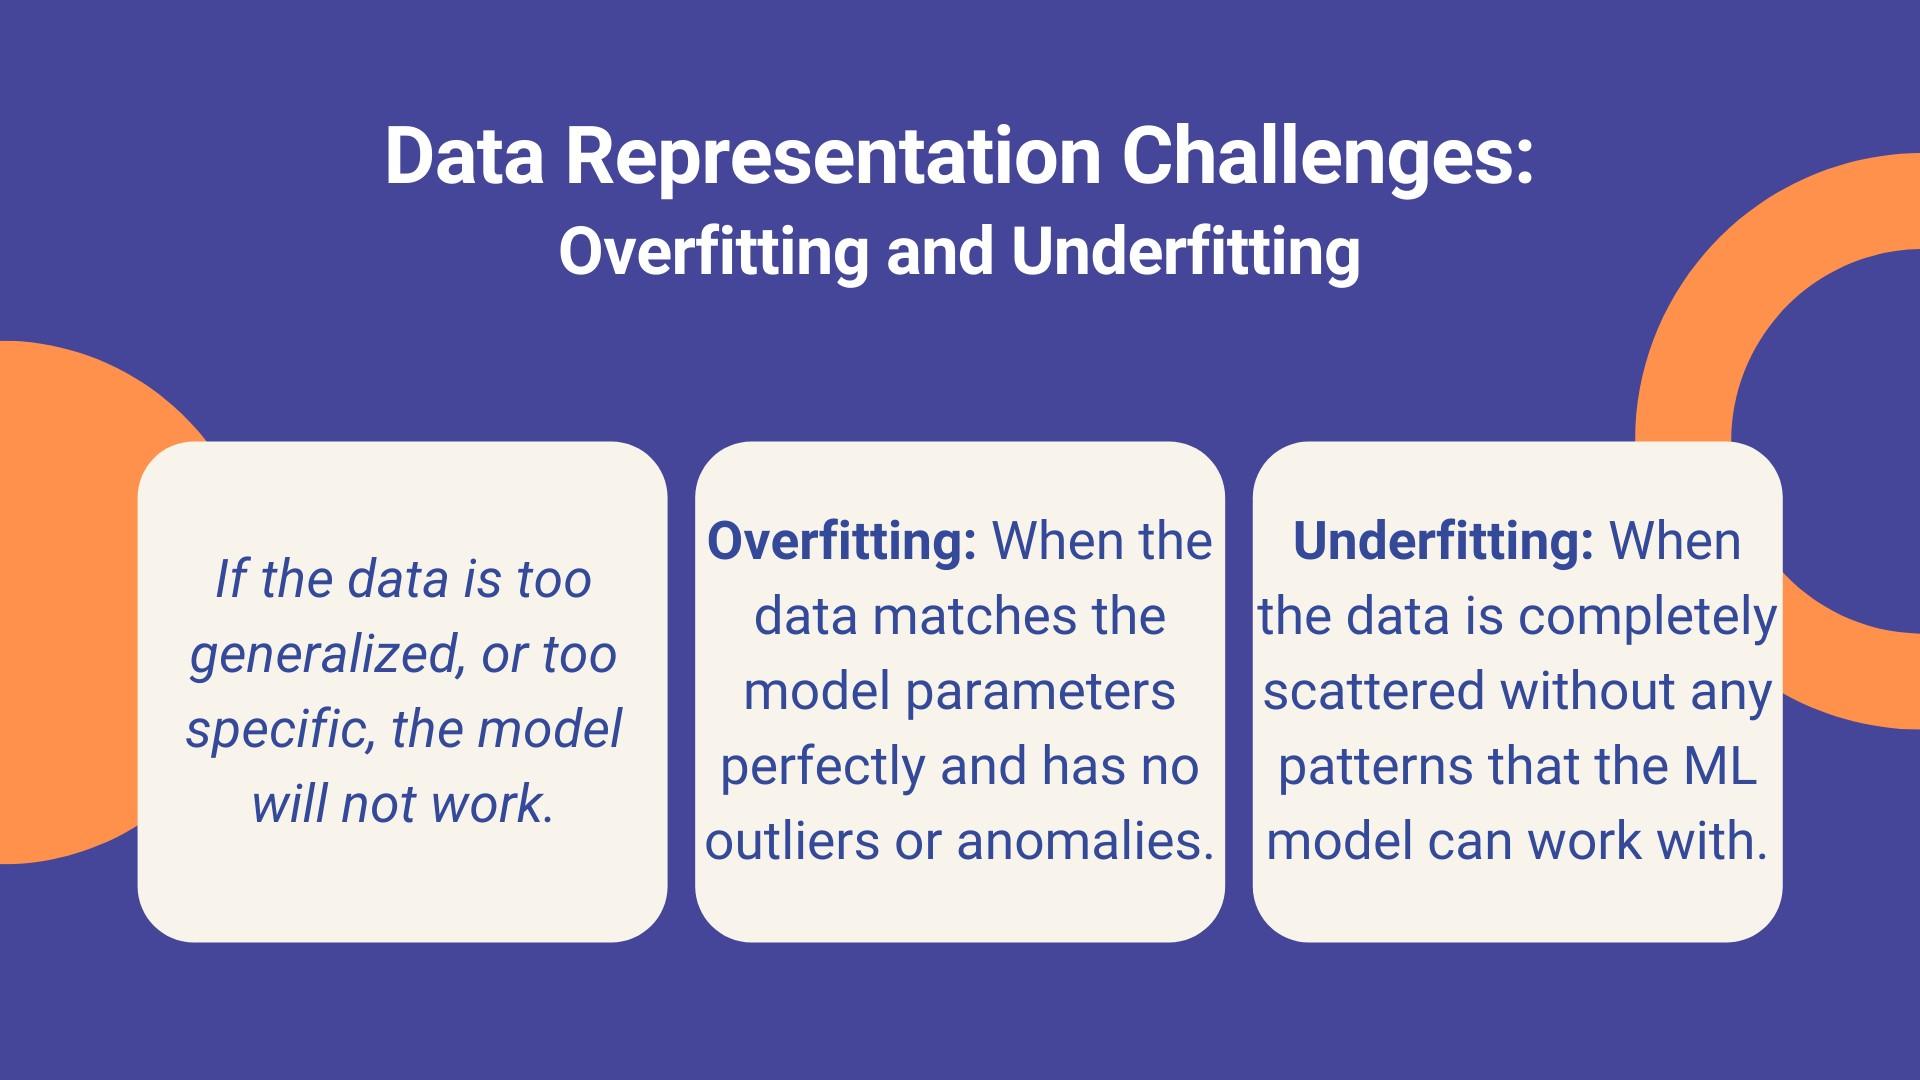 Data Representation Challenges